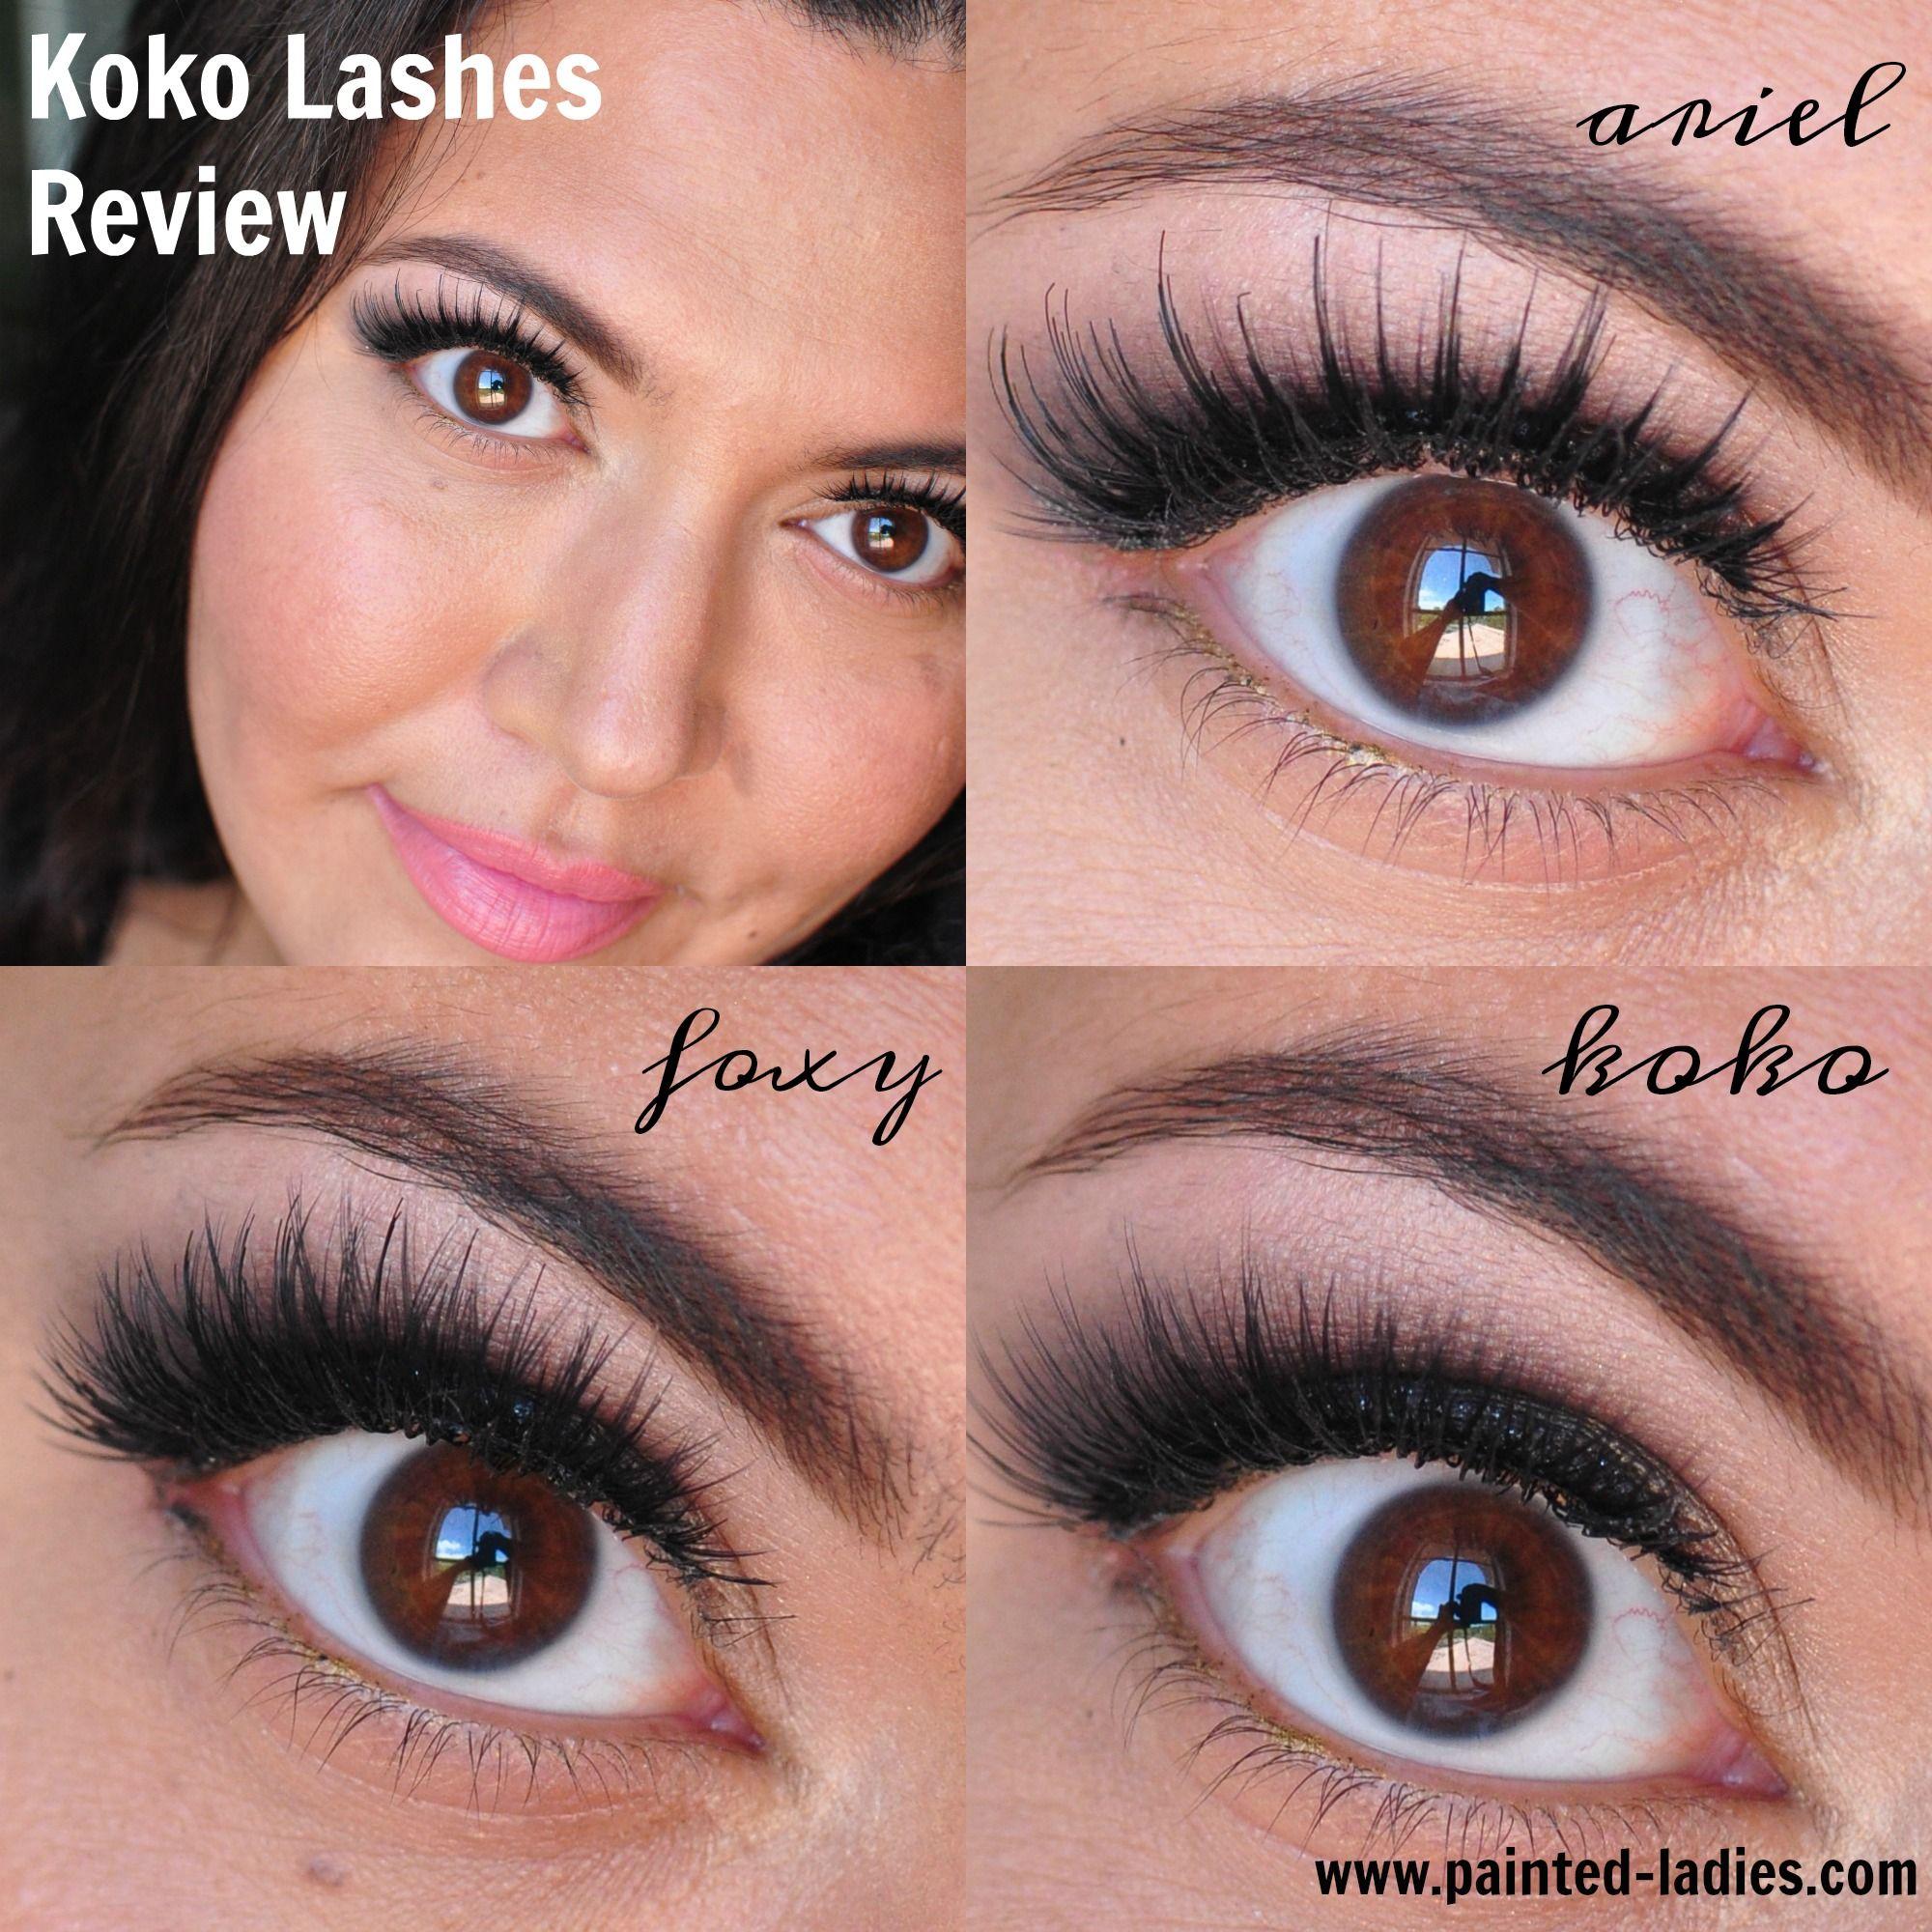 89b11fbf1cf Koko Lashes in Ariel, Koko, and Foxy Review | Me So Pretty | Koko ...